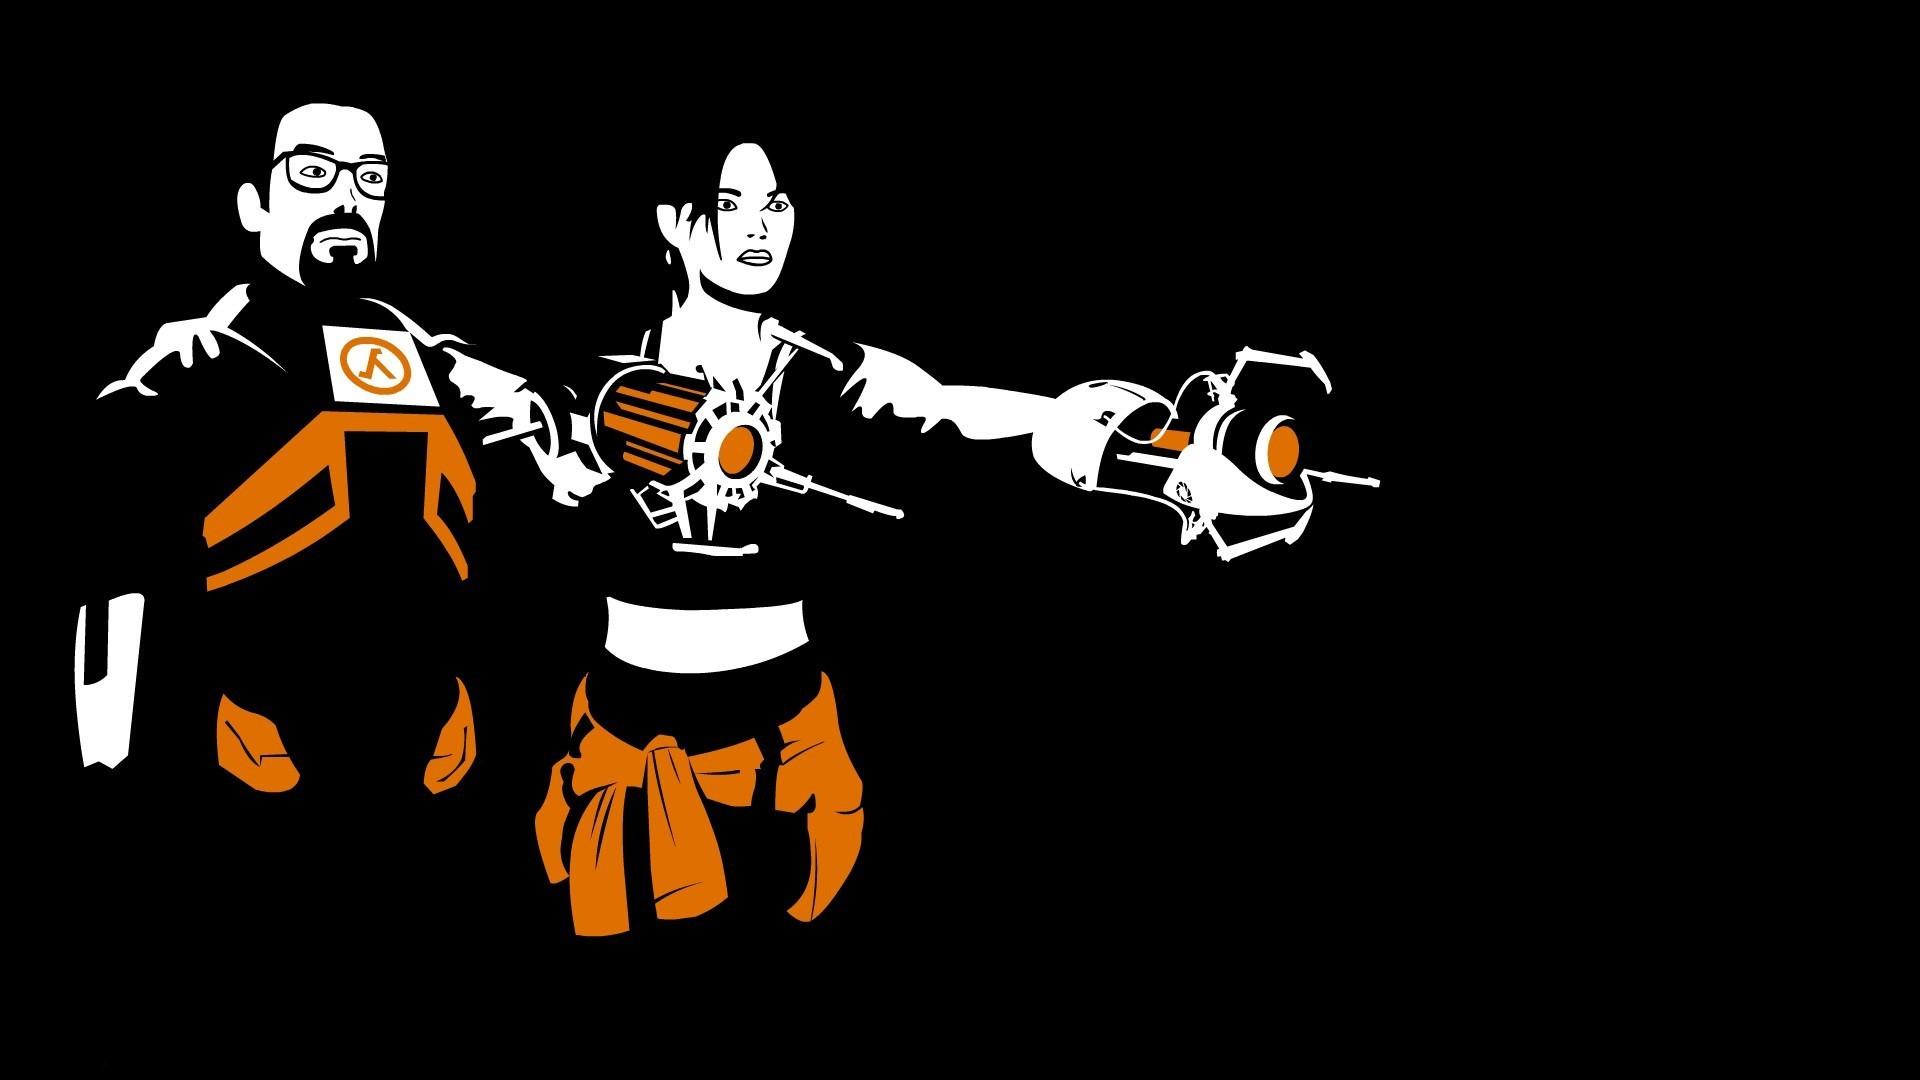 Wallpaper Gun Video Games Black Background Resident: Wallpaper : 1920x1080 Px, Black Background, Half Life 2